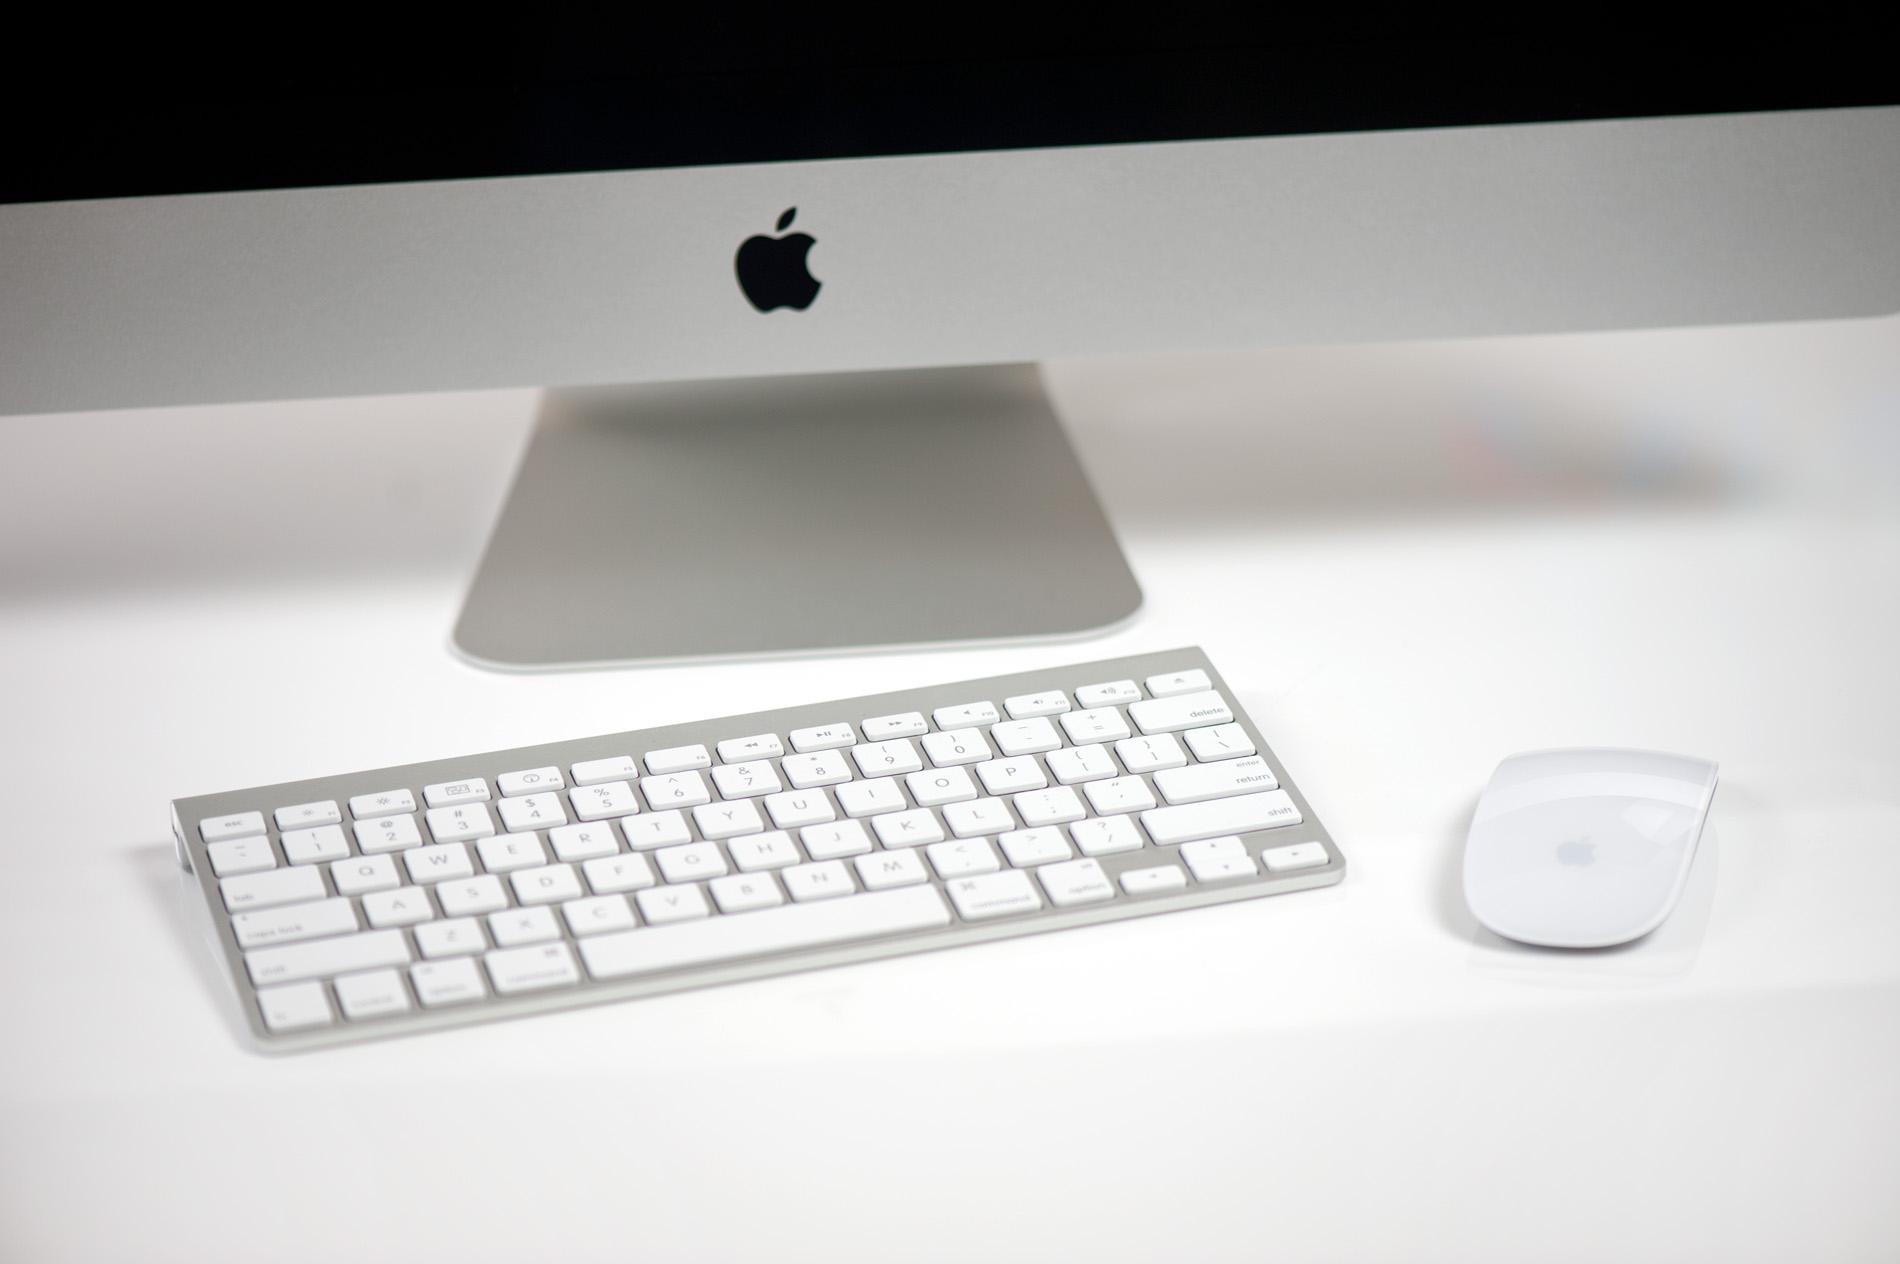 Apple представила 21.5-дюймовый iMac с Retina 4K-дисплеем, новые Magic Trackpad, Magic Mouse и клавиатуру